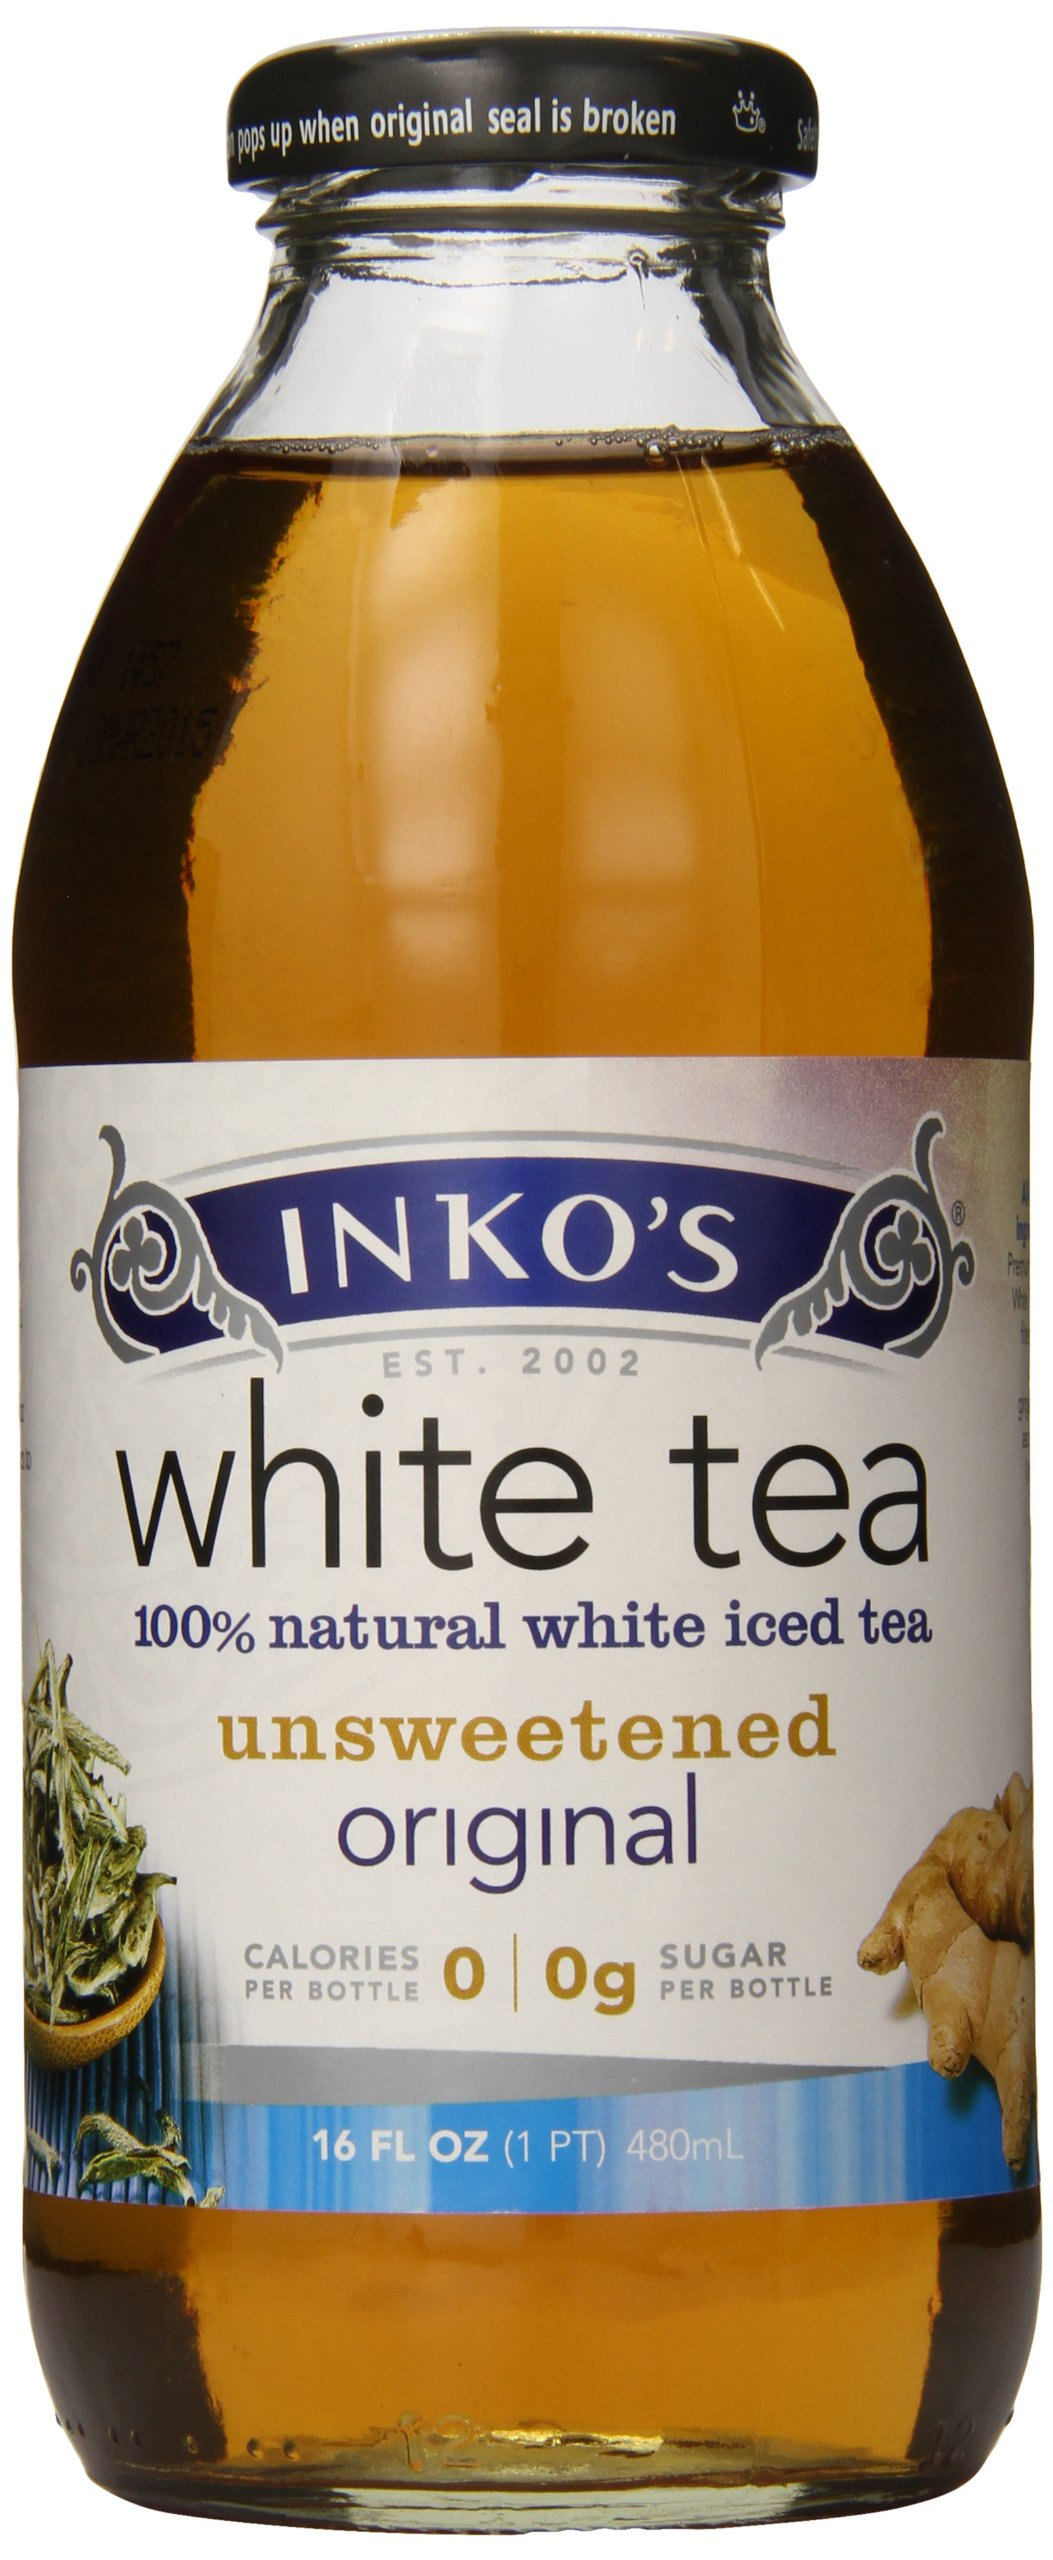 Inkos White Tea, Organicanic, 16 Ounce by Inkos